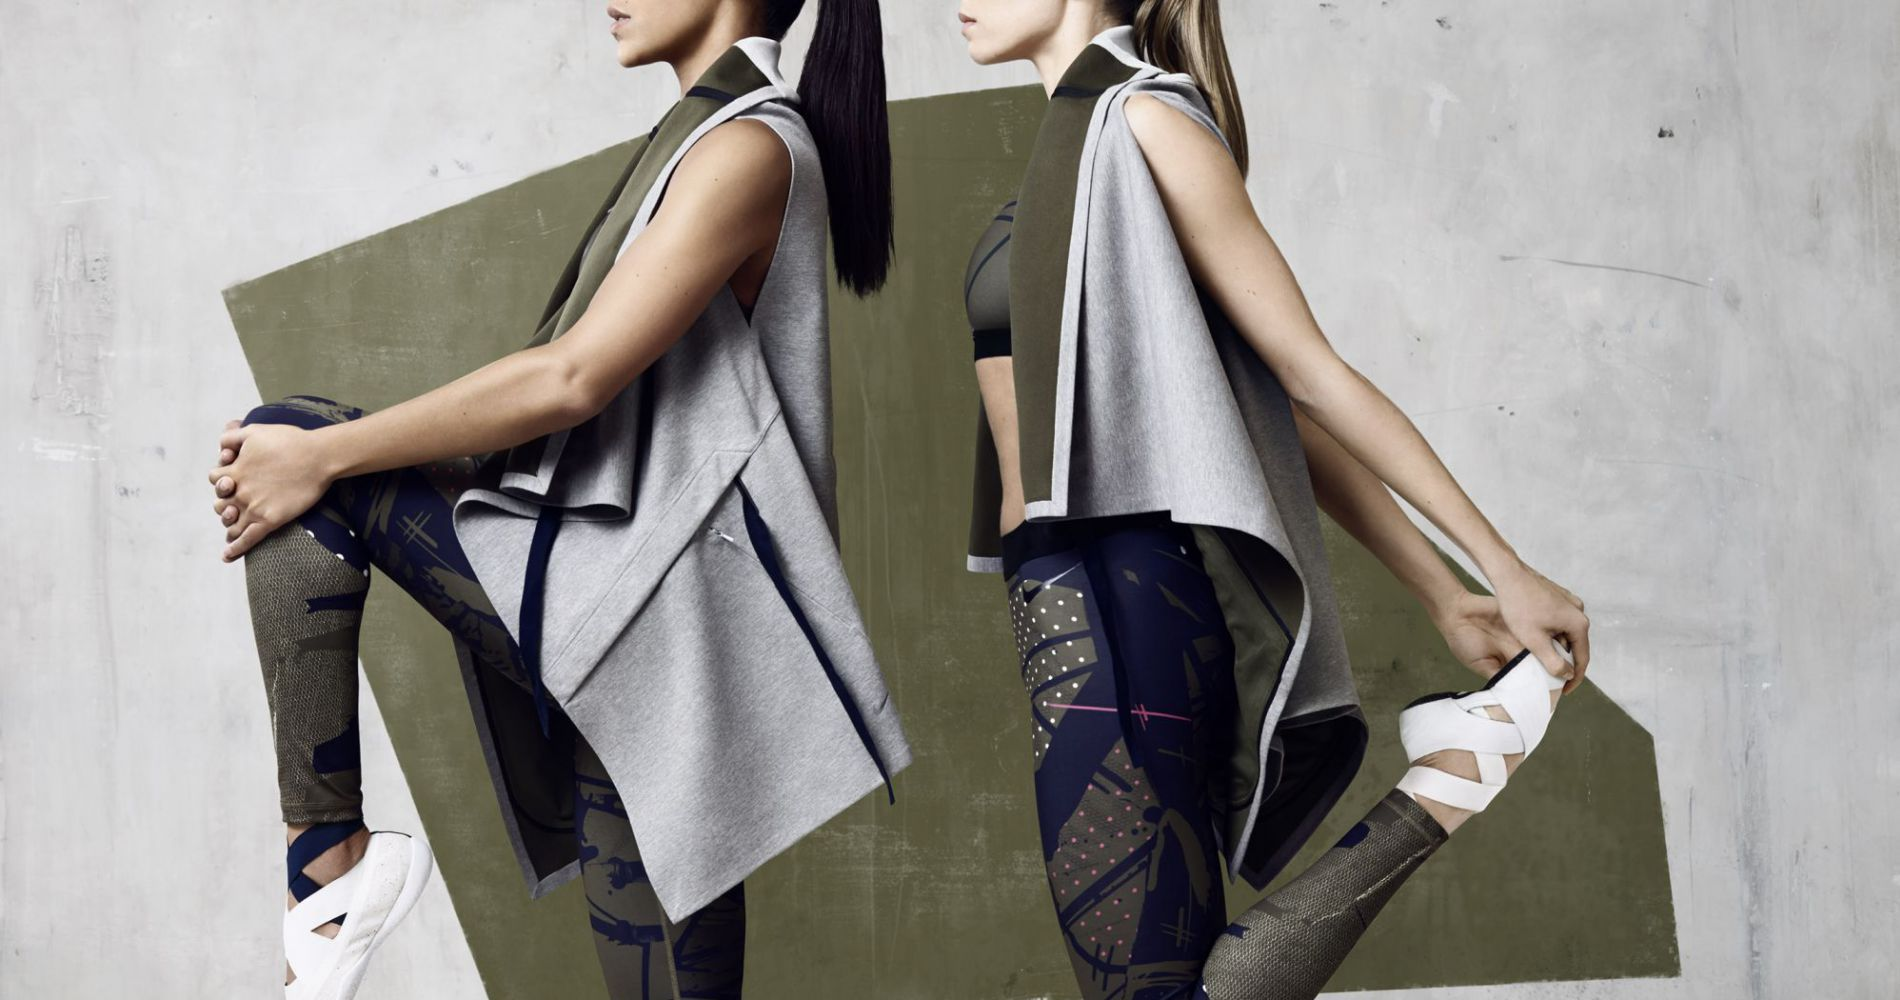 Nike et Johanna Schneider : la jolie collab' sport et mode